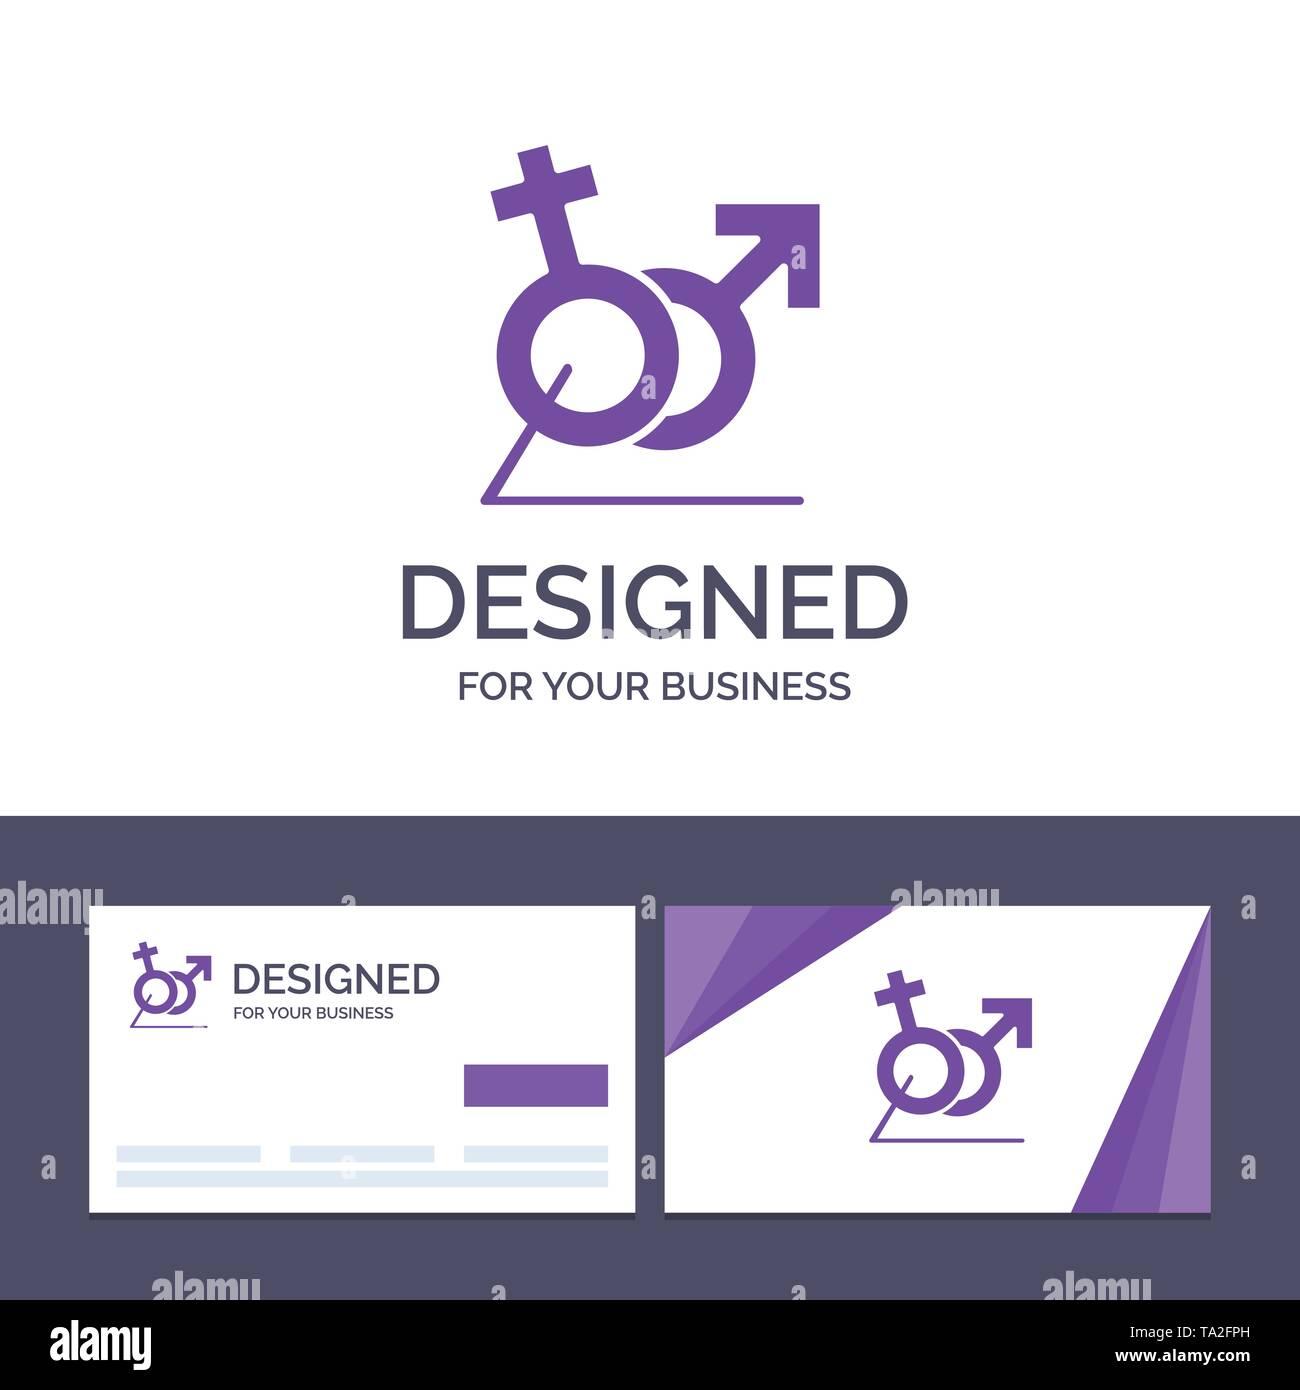 Creative Business Card and Logo template Men, Women, Sign, Gander, Identity Vector Illustration - Stock Image